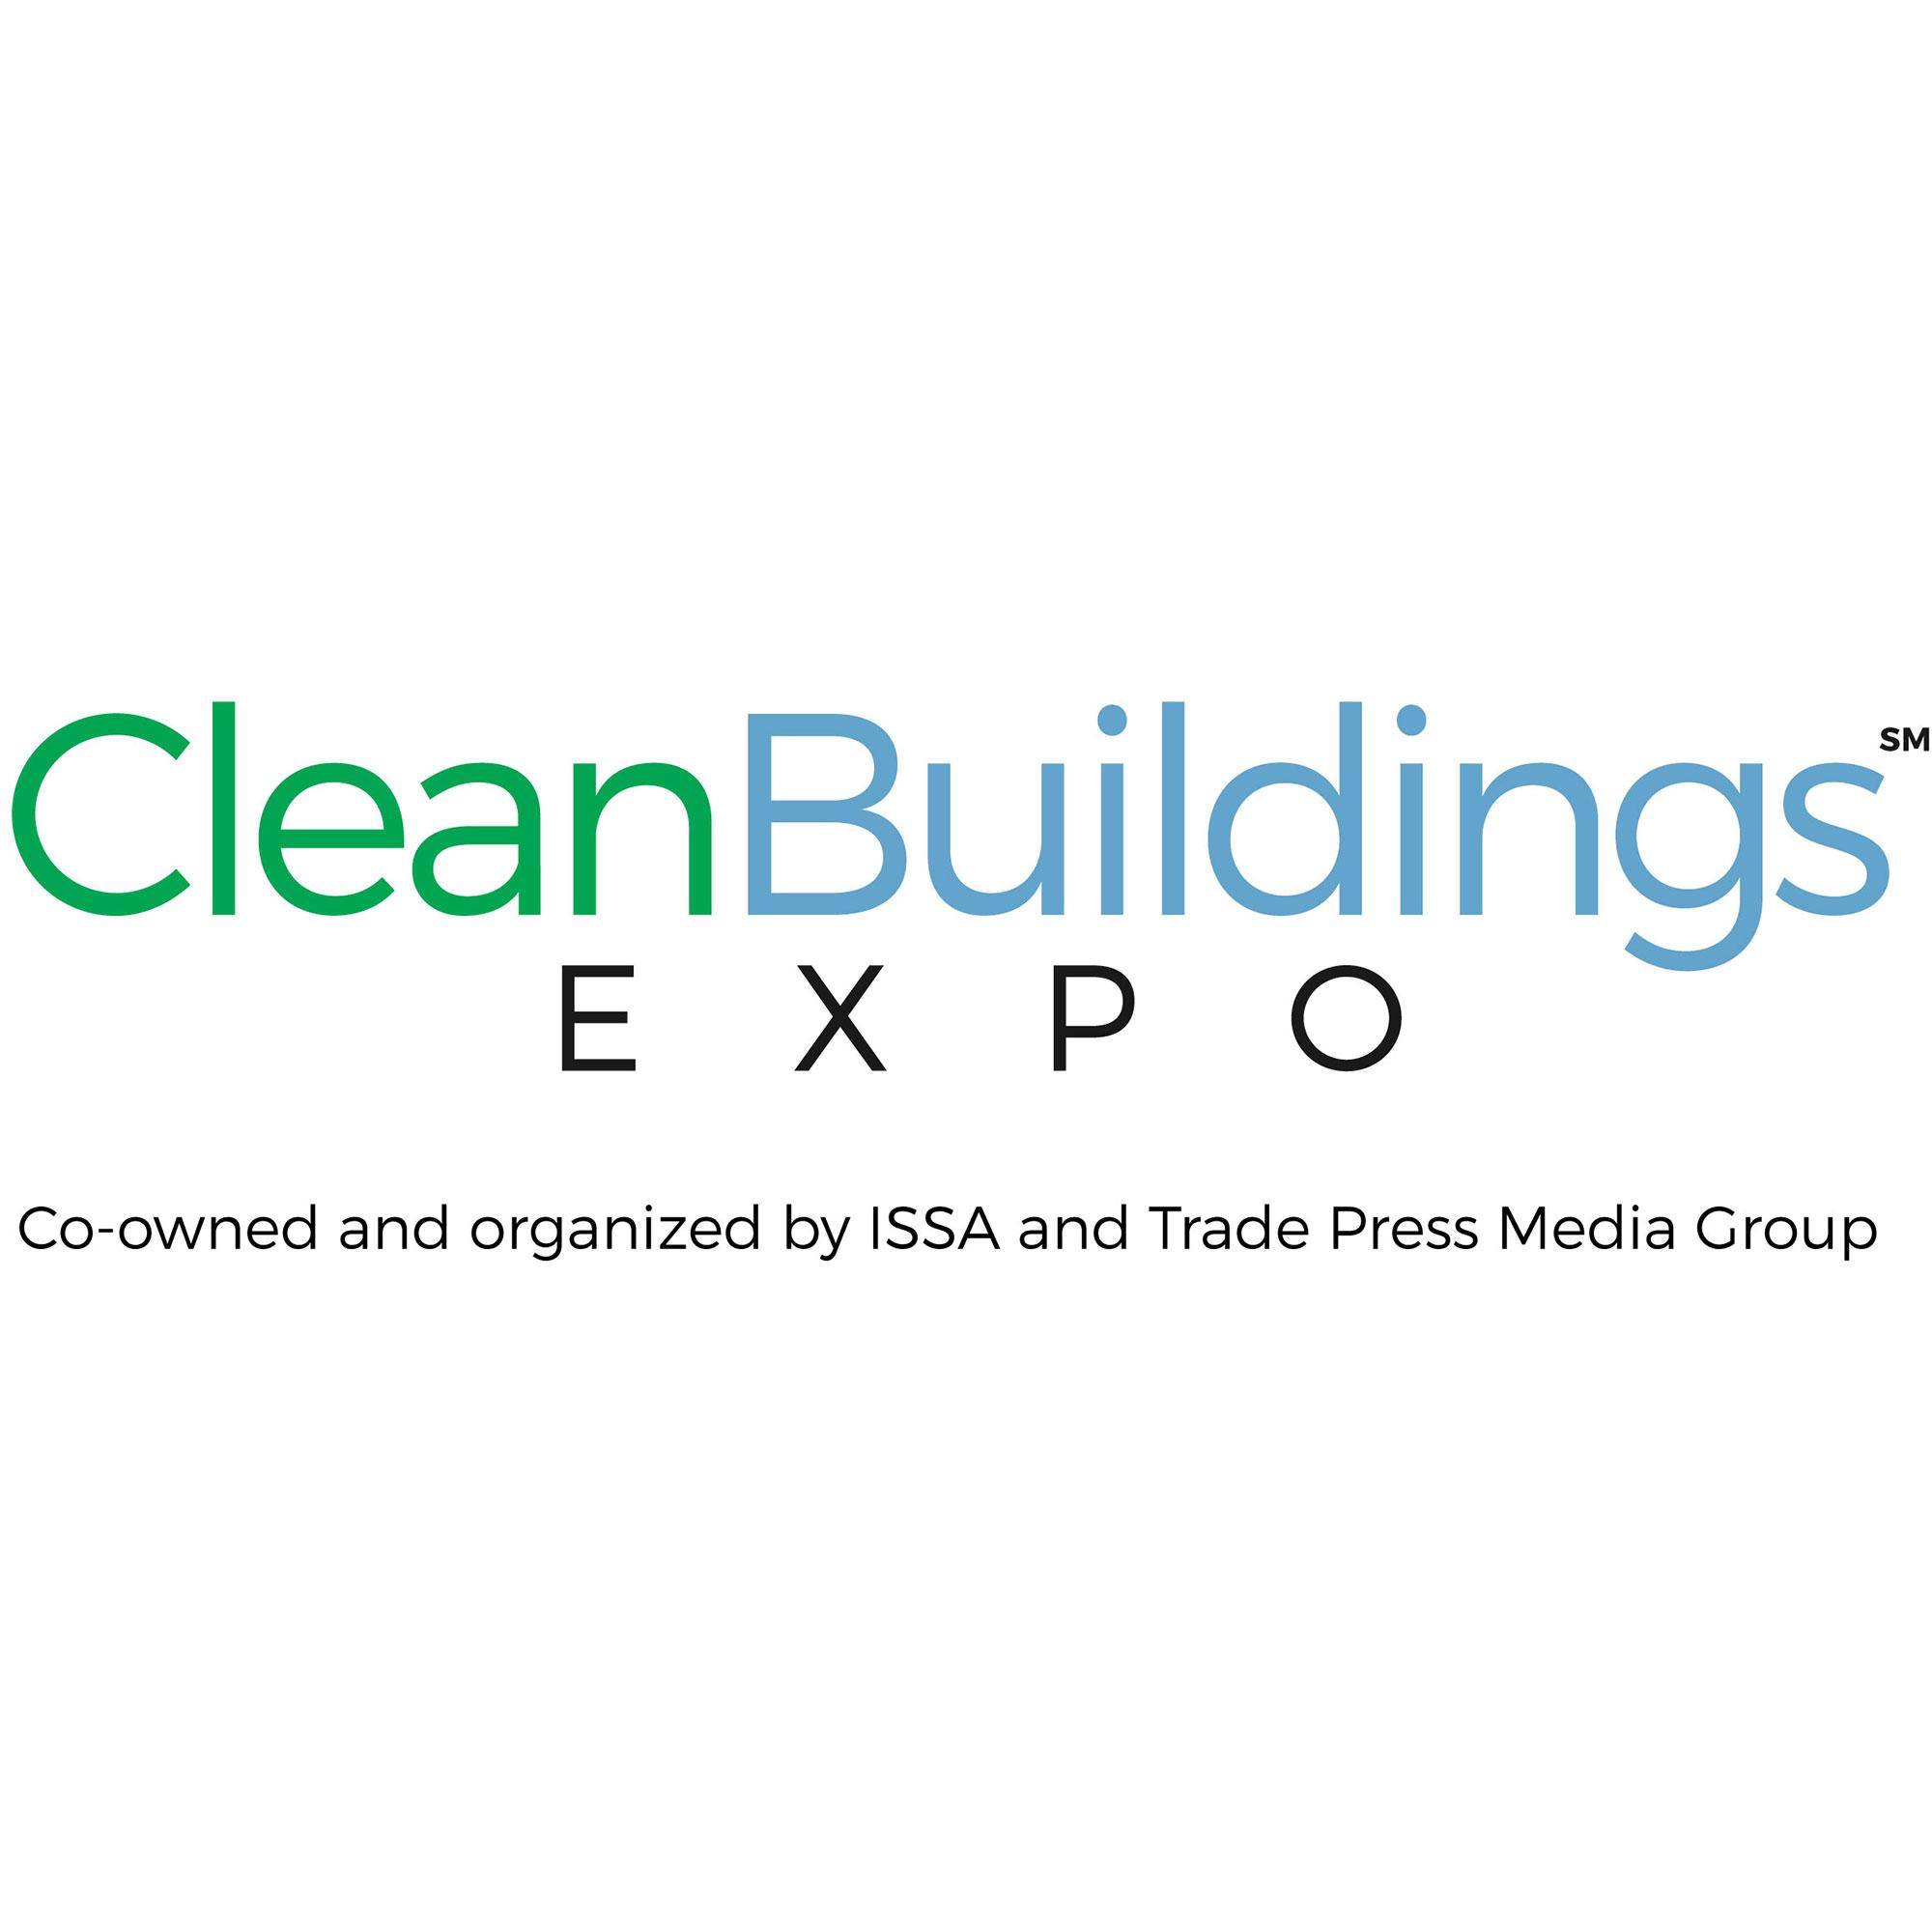 Clean Buildings Expo 2019